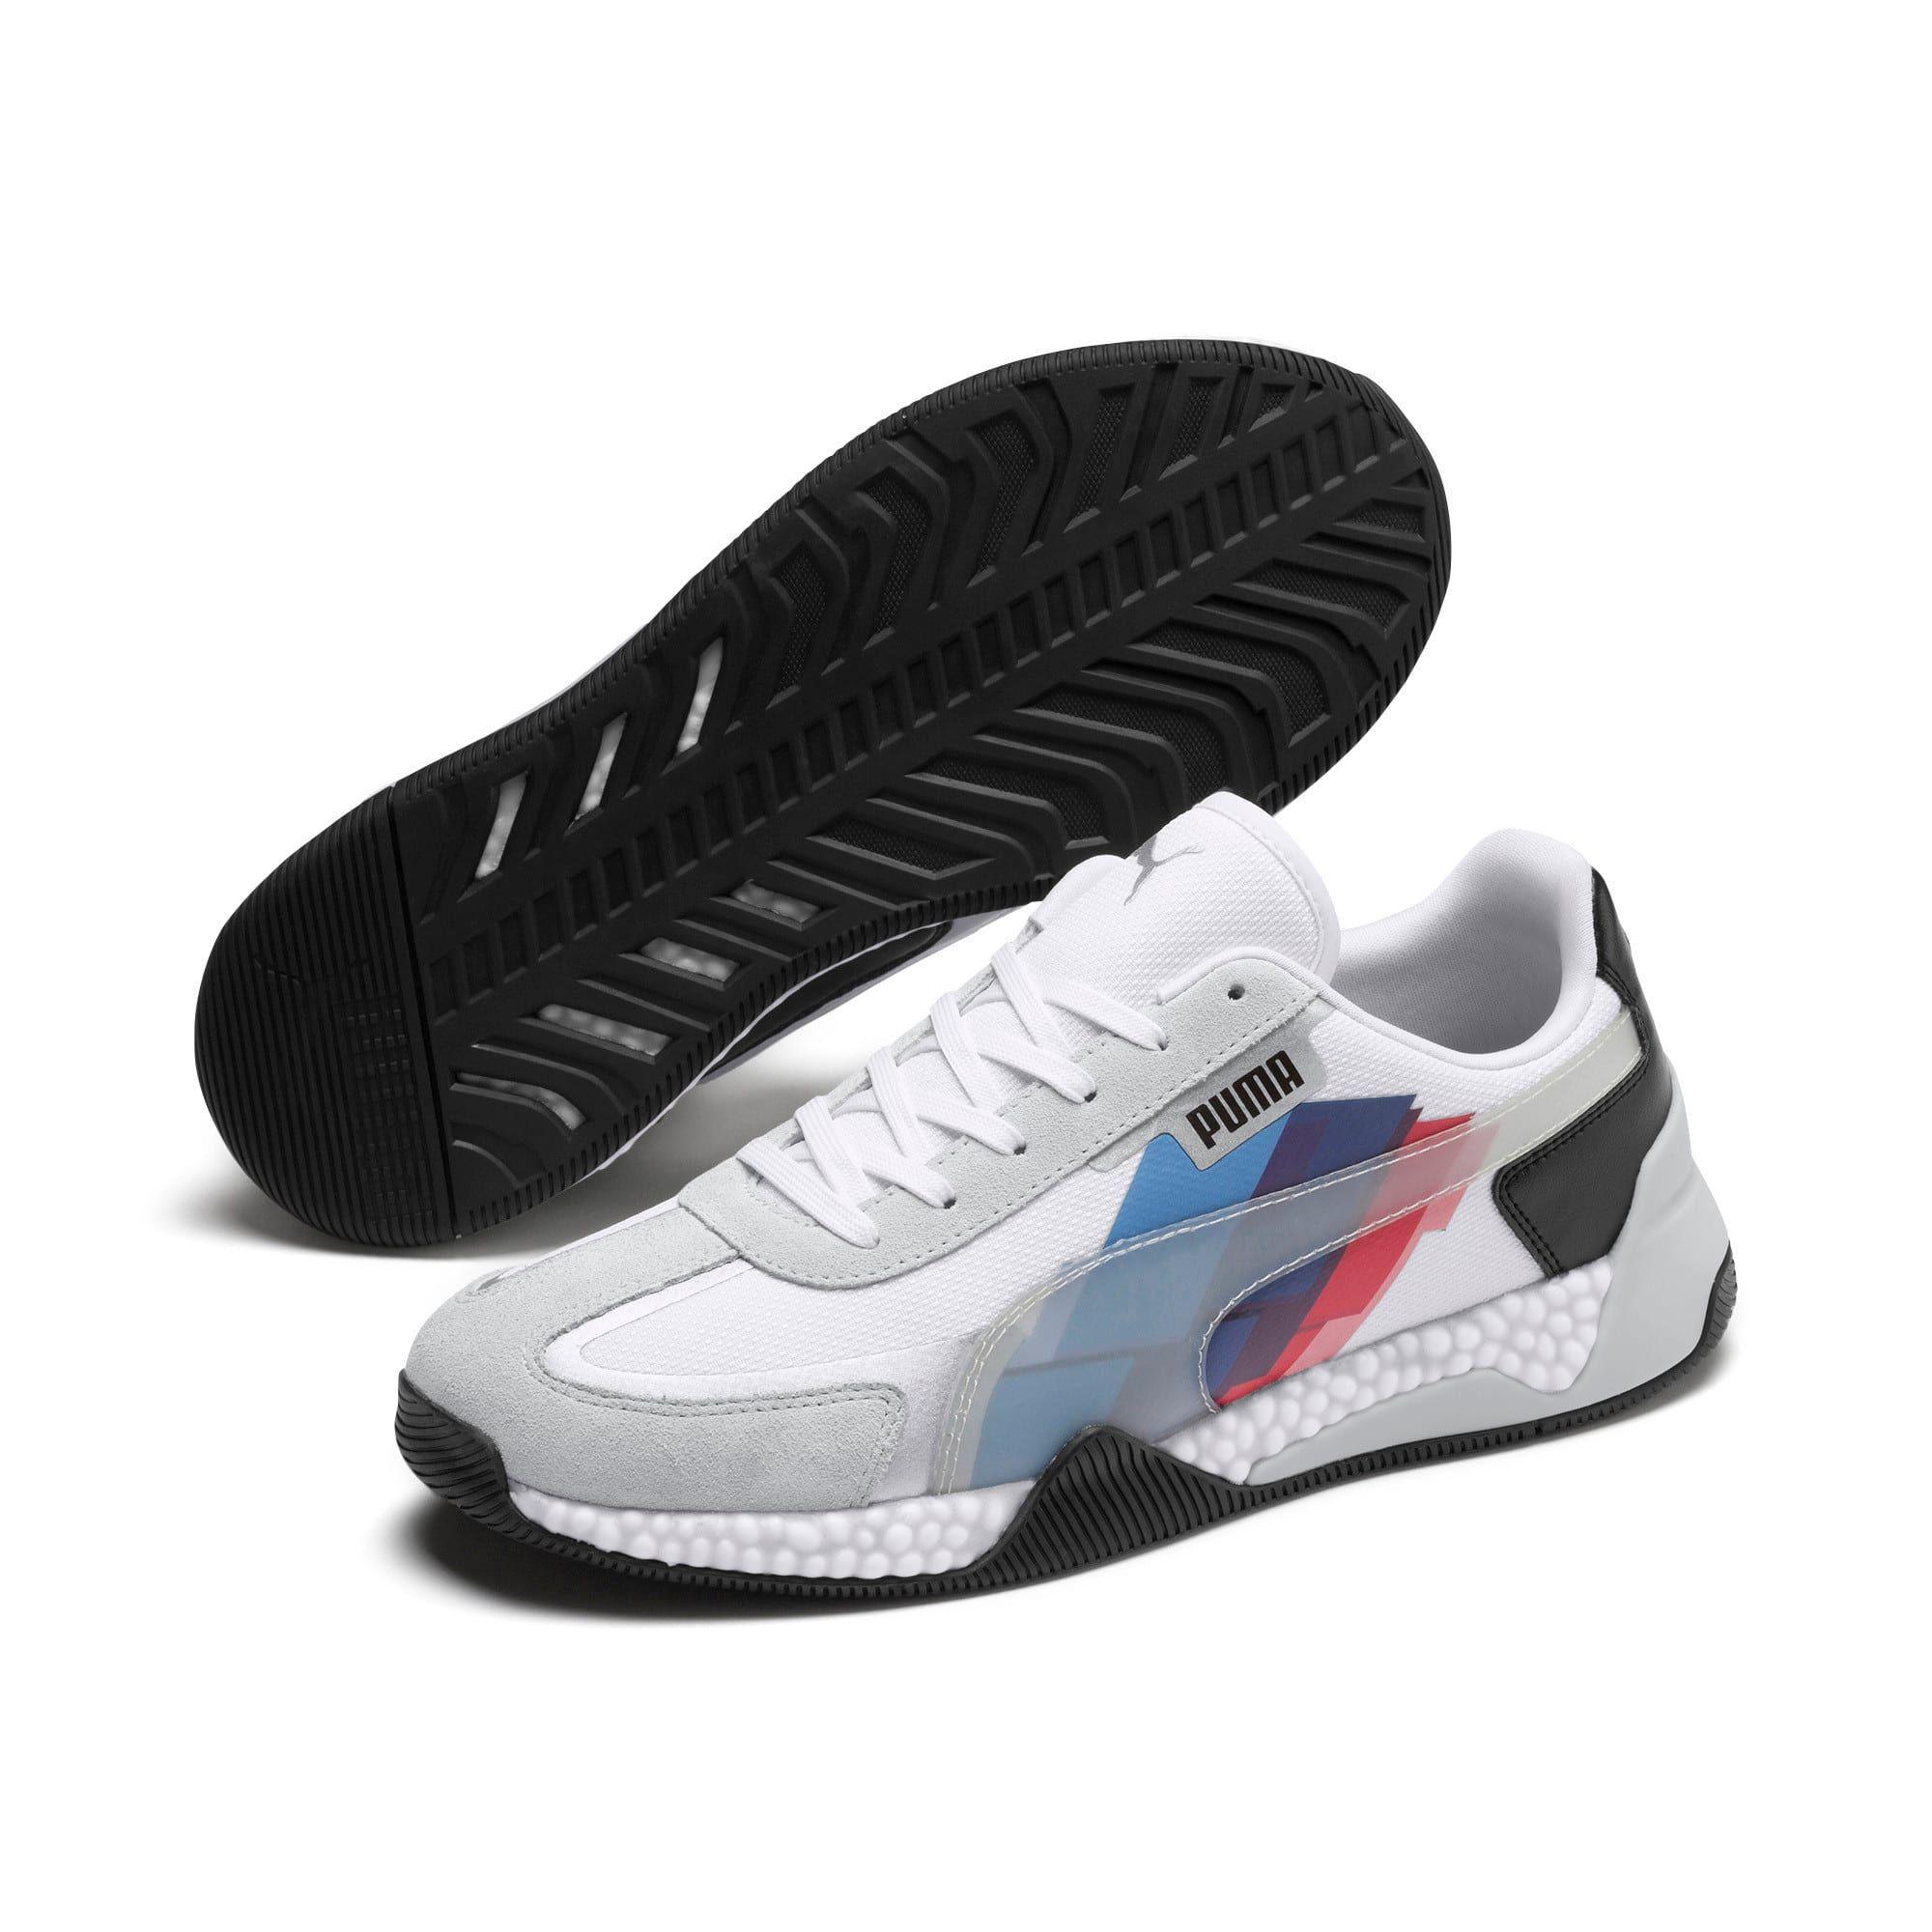 BMW M Motorsport Speed HYBRID Trainers | Bmw, Sneakers, Puma cat